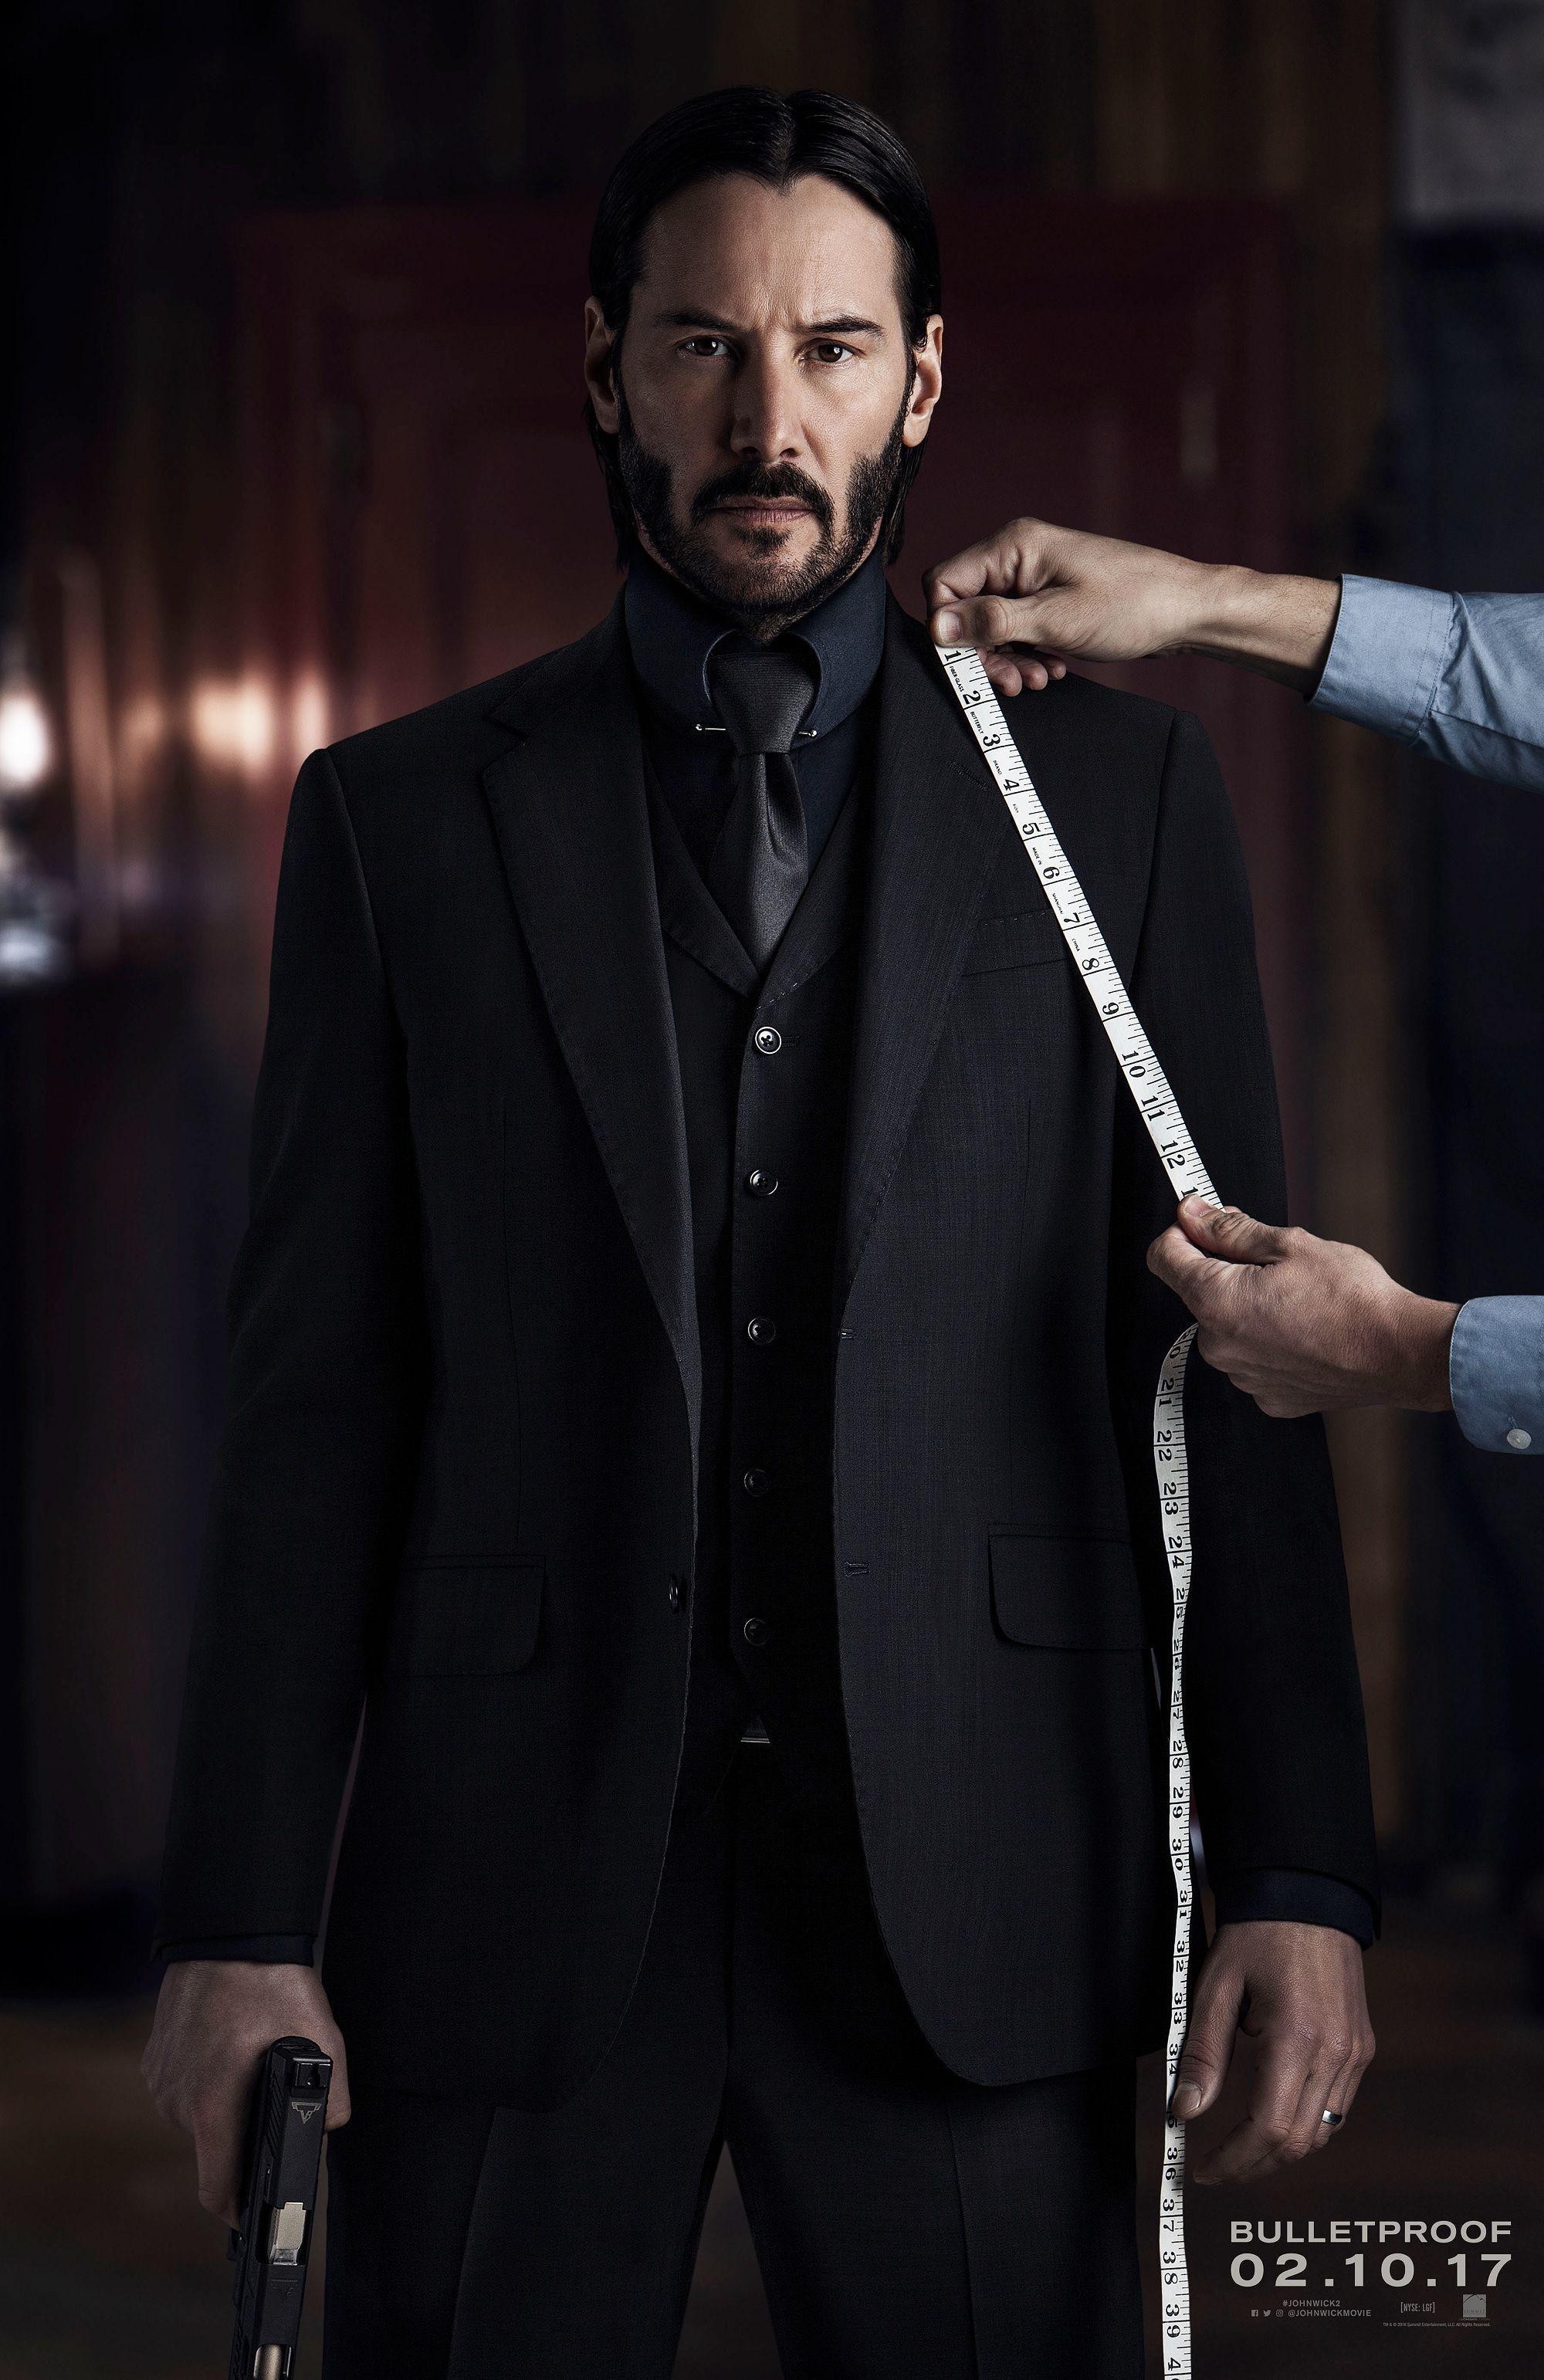 John Wick 2 Poster Sees Keanu Reeves Hitman Dressed To Kill